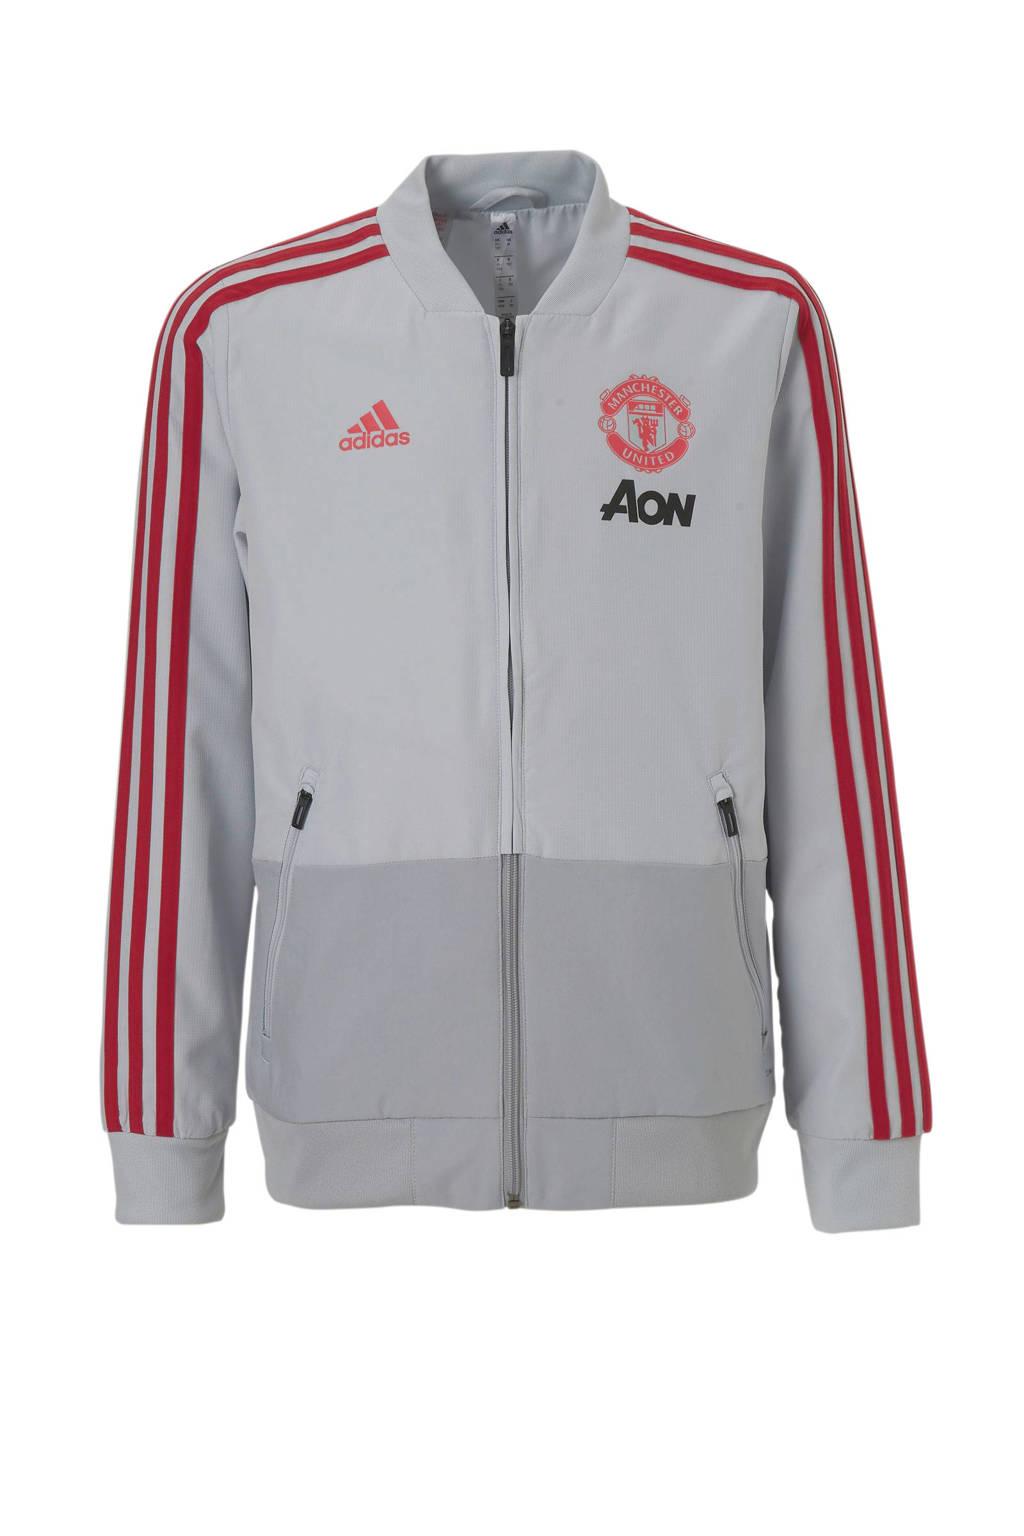 adidas performance Junior Manchester United voetbaljack, Grijs/rood